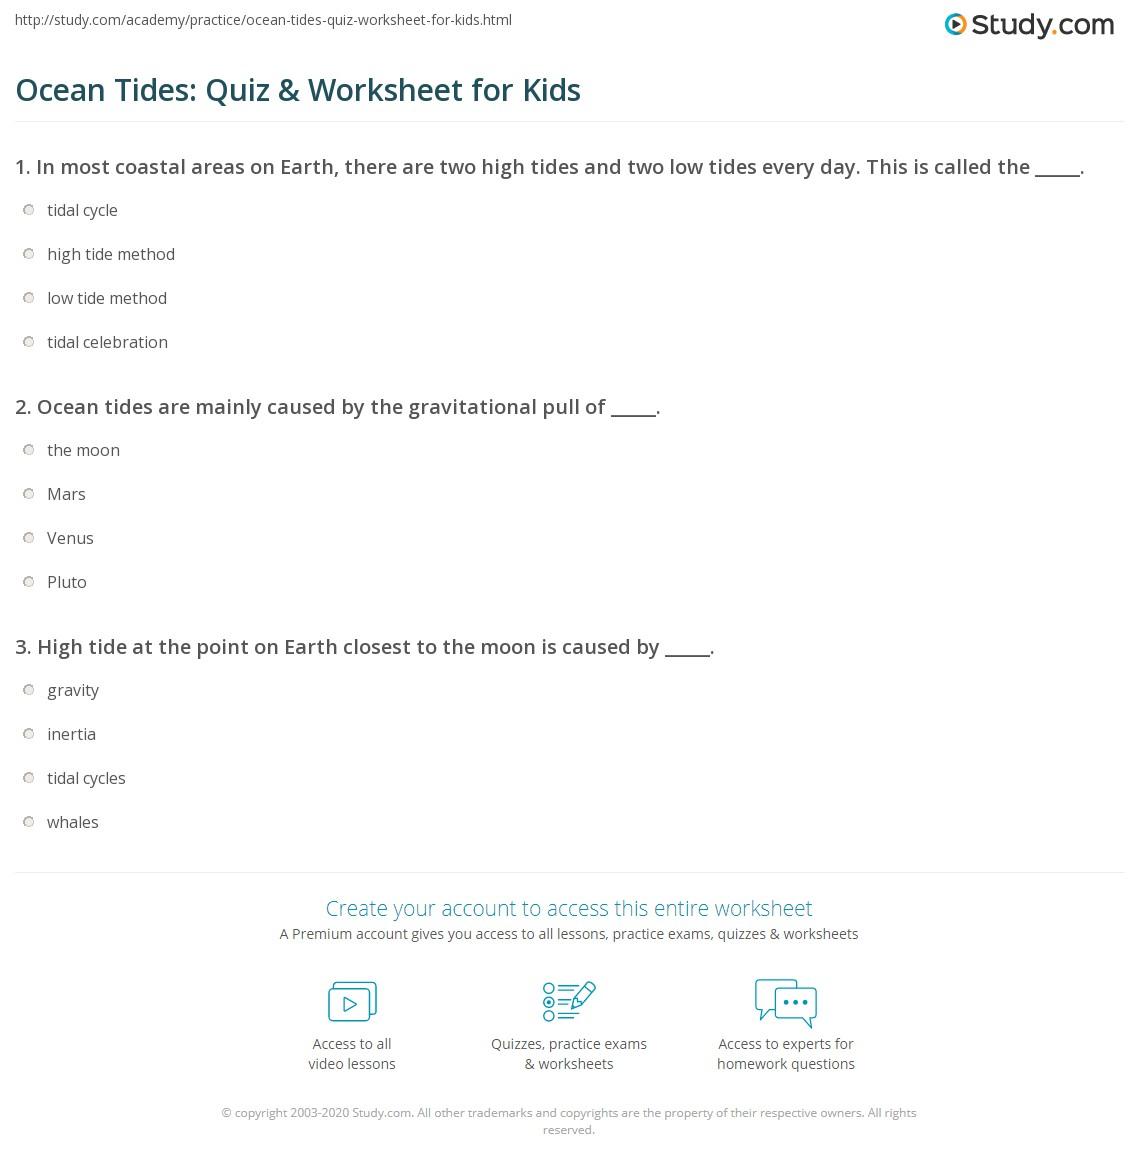 29 Credit Card Worksheet For High School Students Free Worksheet Spreadsheet [ 1169 x 1140 Pixel ]